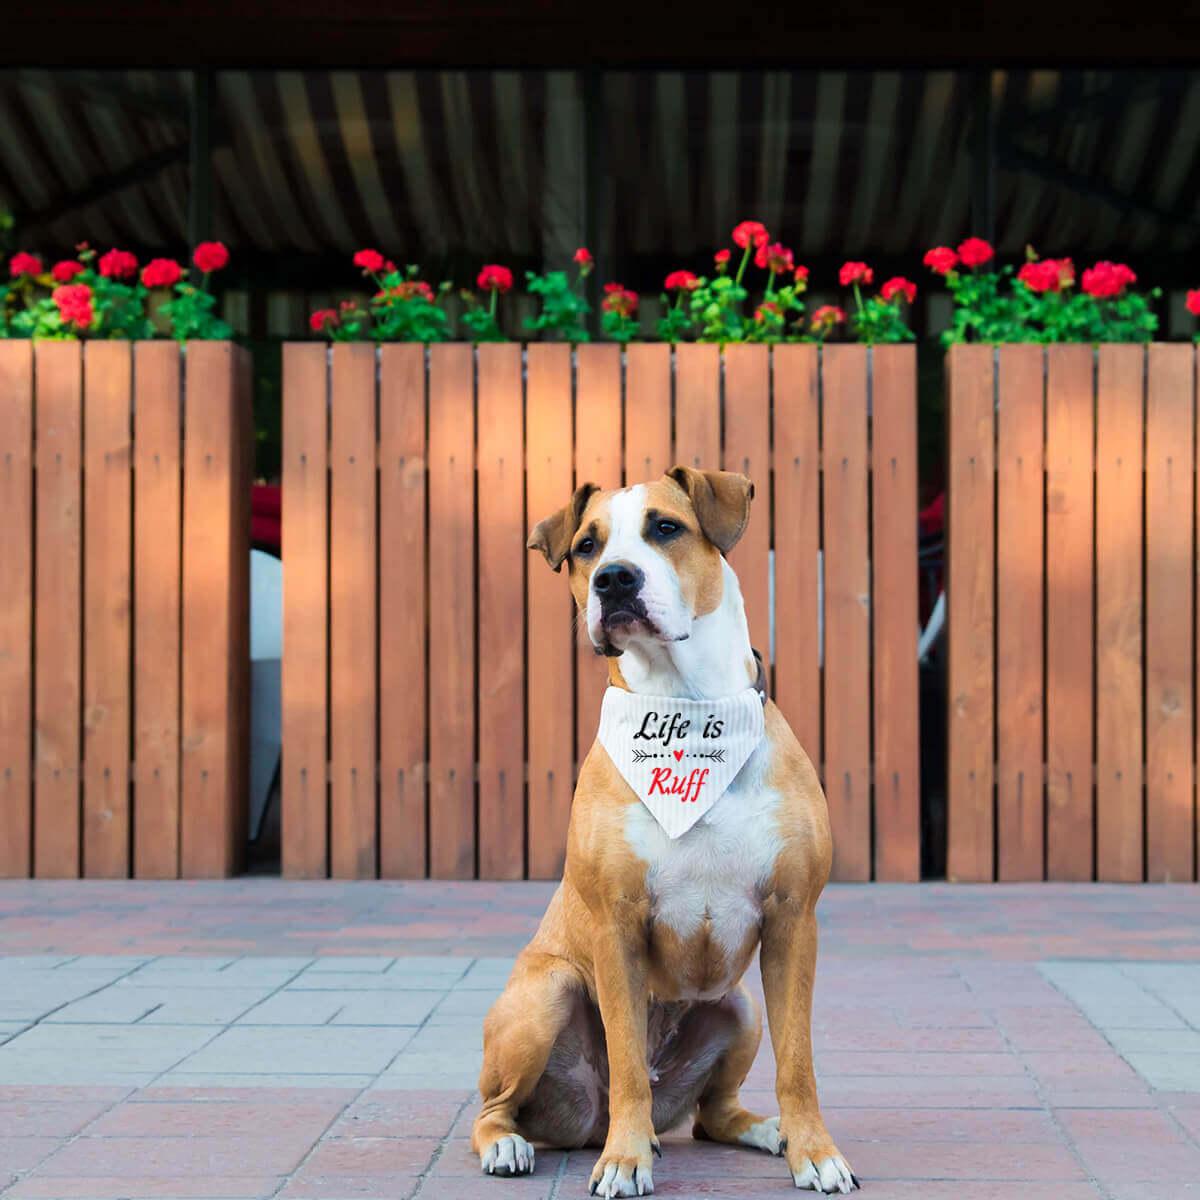 Dog_Bandana-2